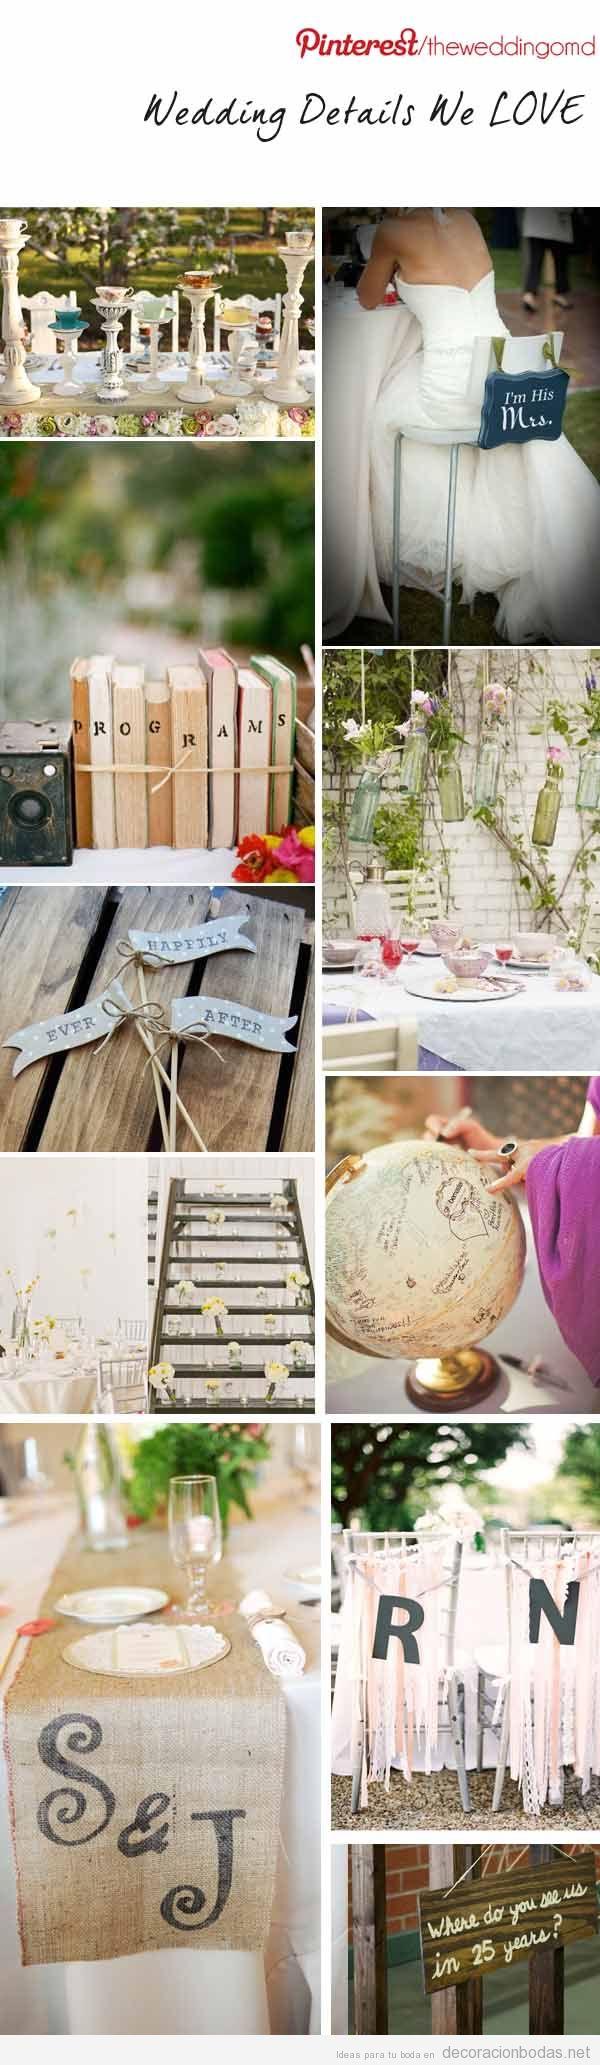 Candelabros archivos decoraci n bodas - Detalles decoracion boda ...